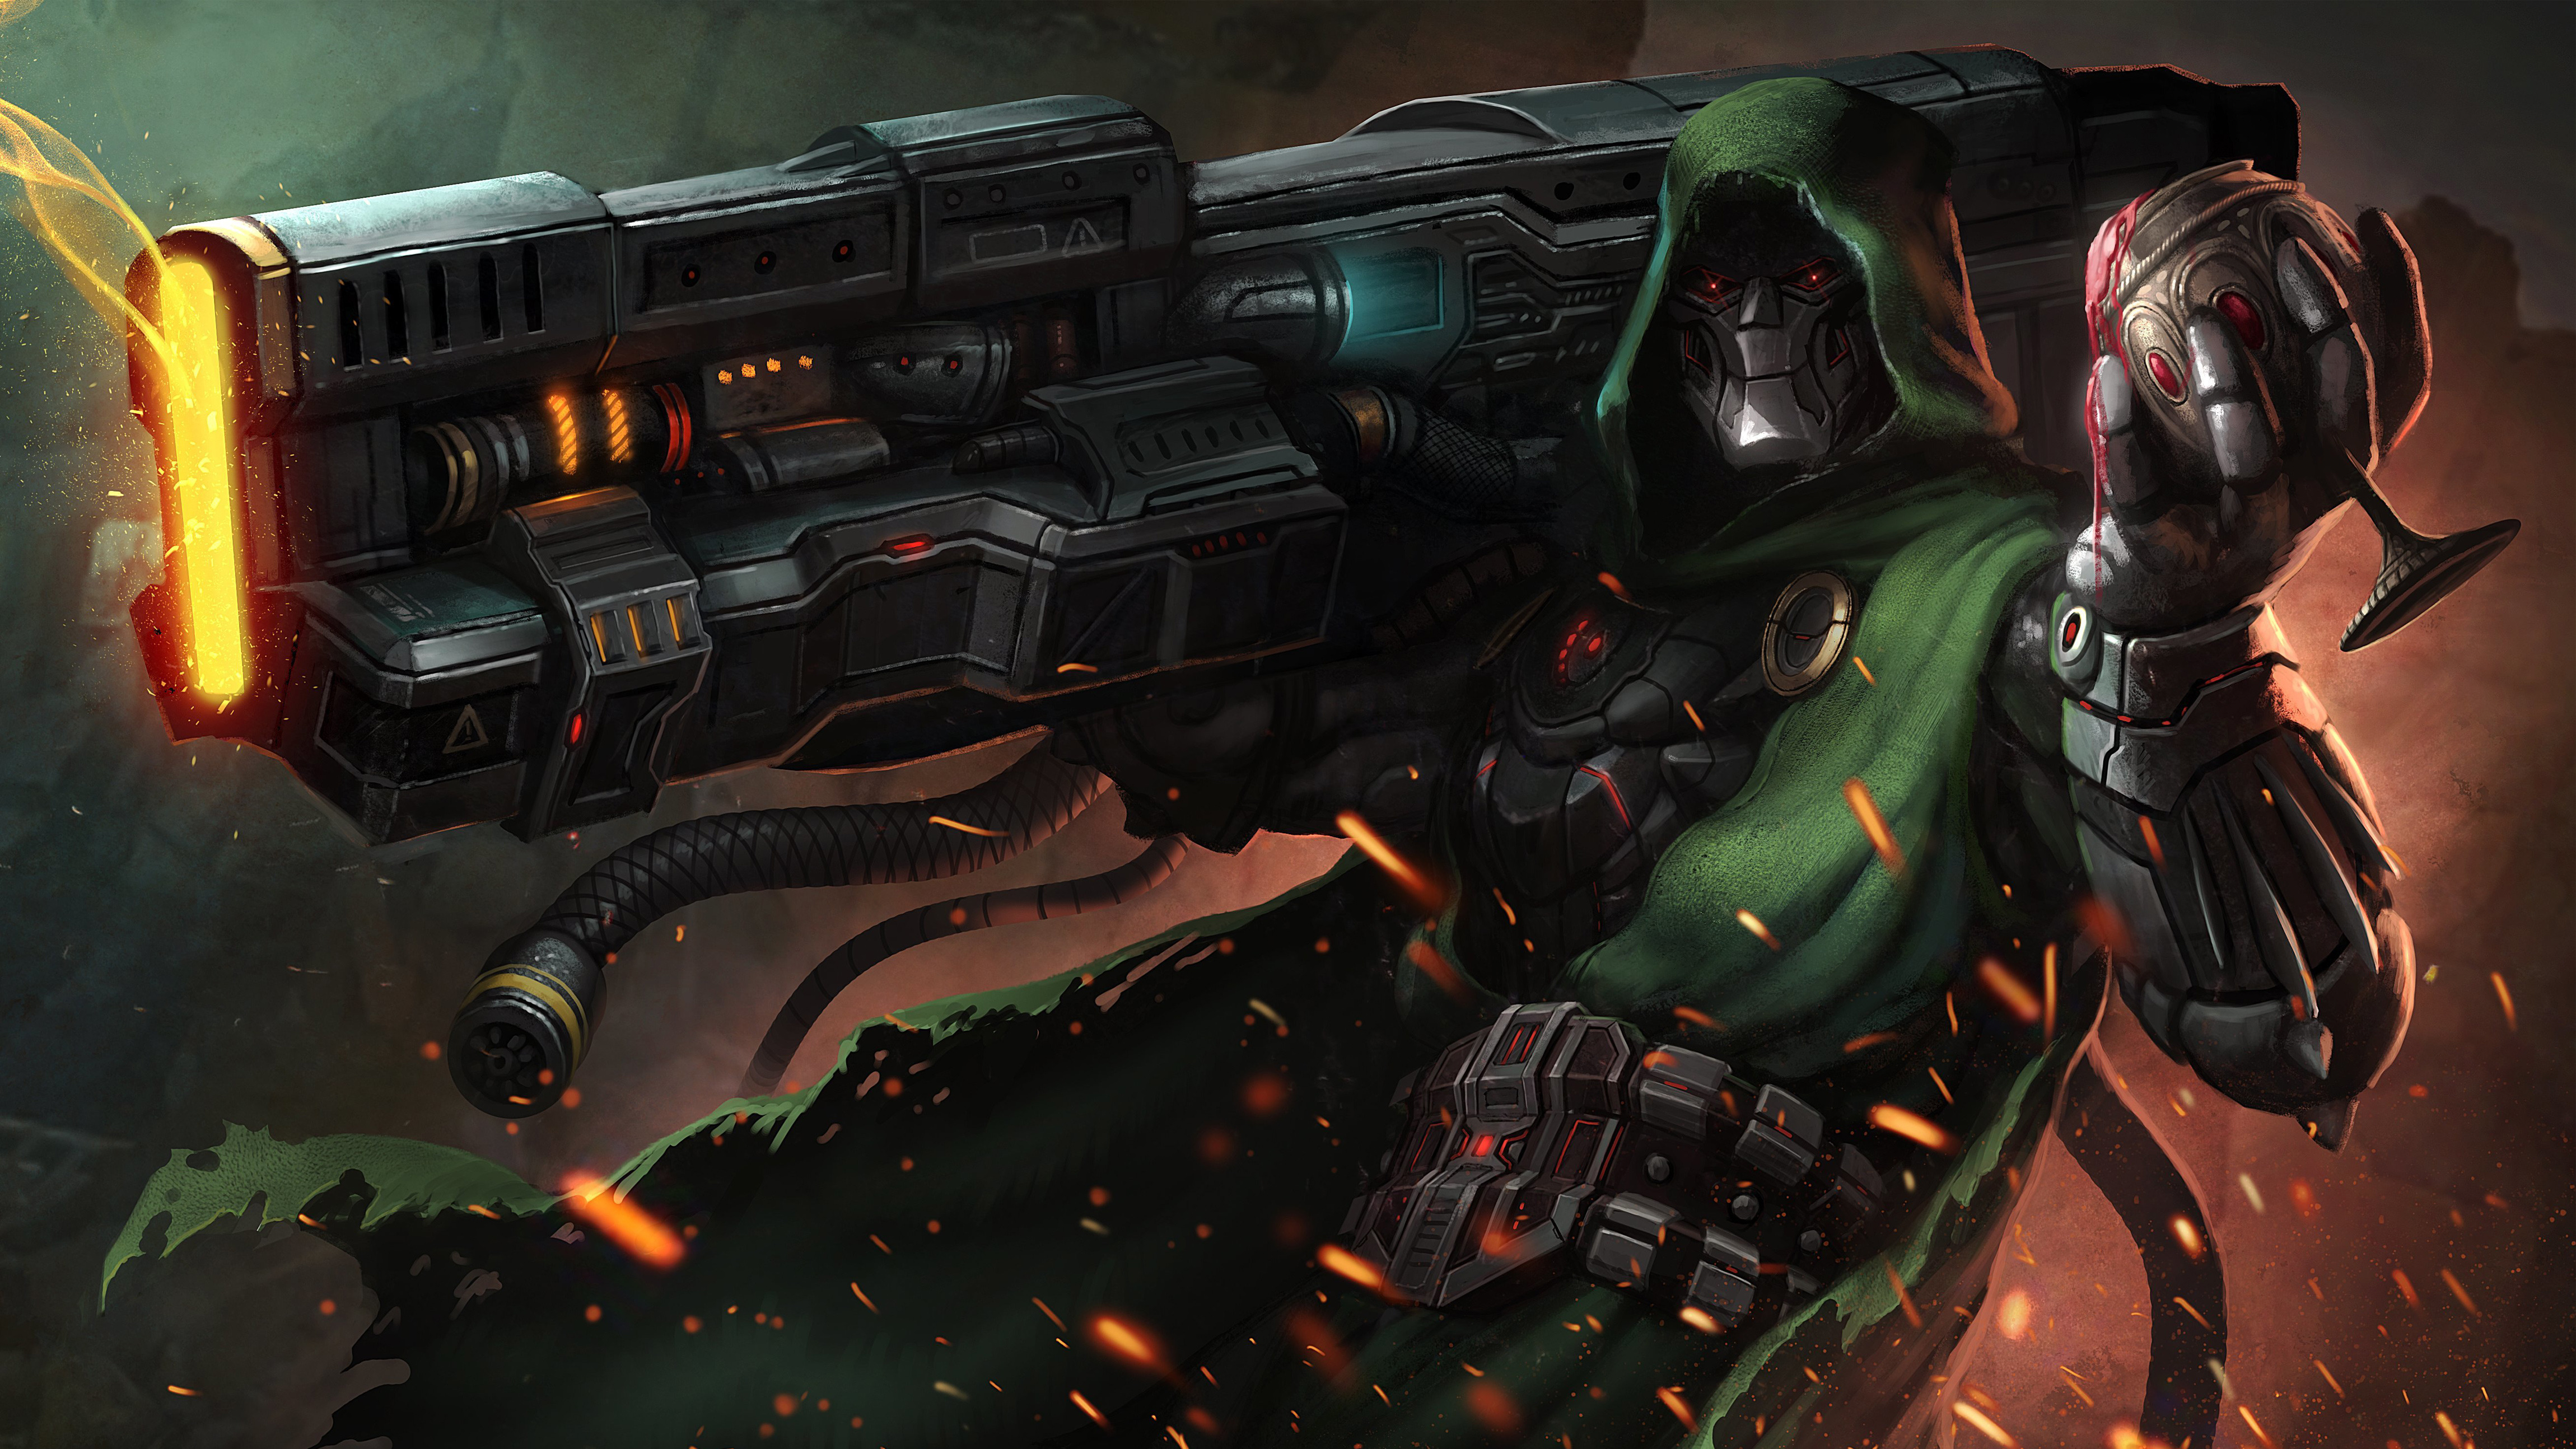 Doctor Doom Supervillain Marvel Comics 4k, HD Artist, 4k ...